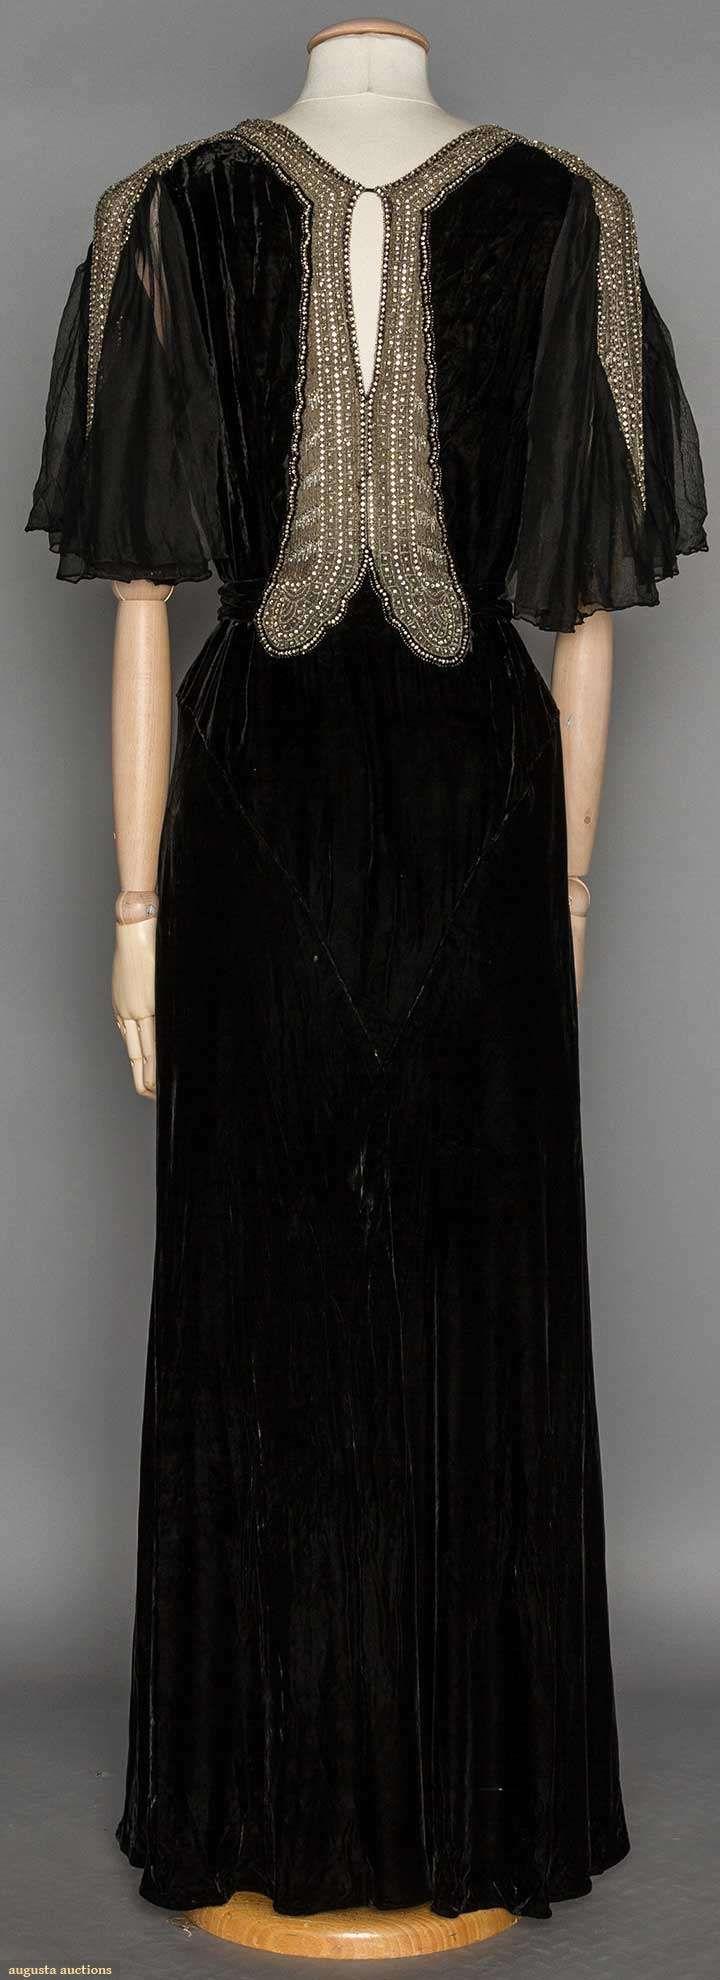 RHINESTONE TRIMMED EVENING GOWN, 1930's   Black silk velvet, chiffon flutter short sleeves, key-hole back, silver metallic w/ rhinestone neck & sleeve trim (back view)